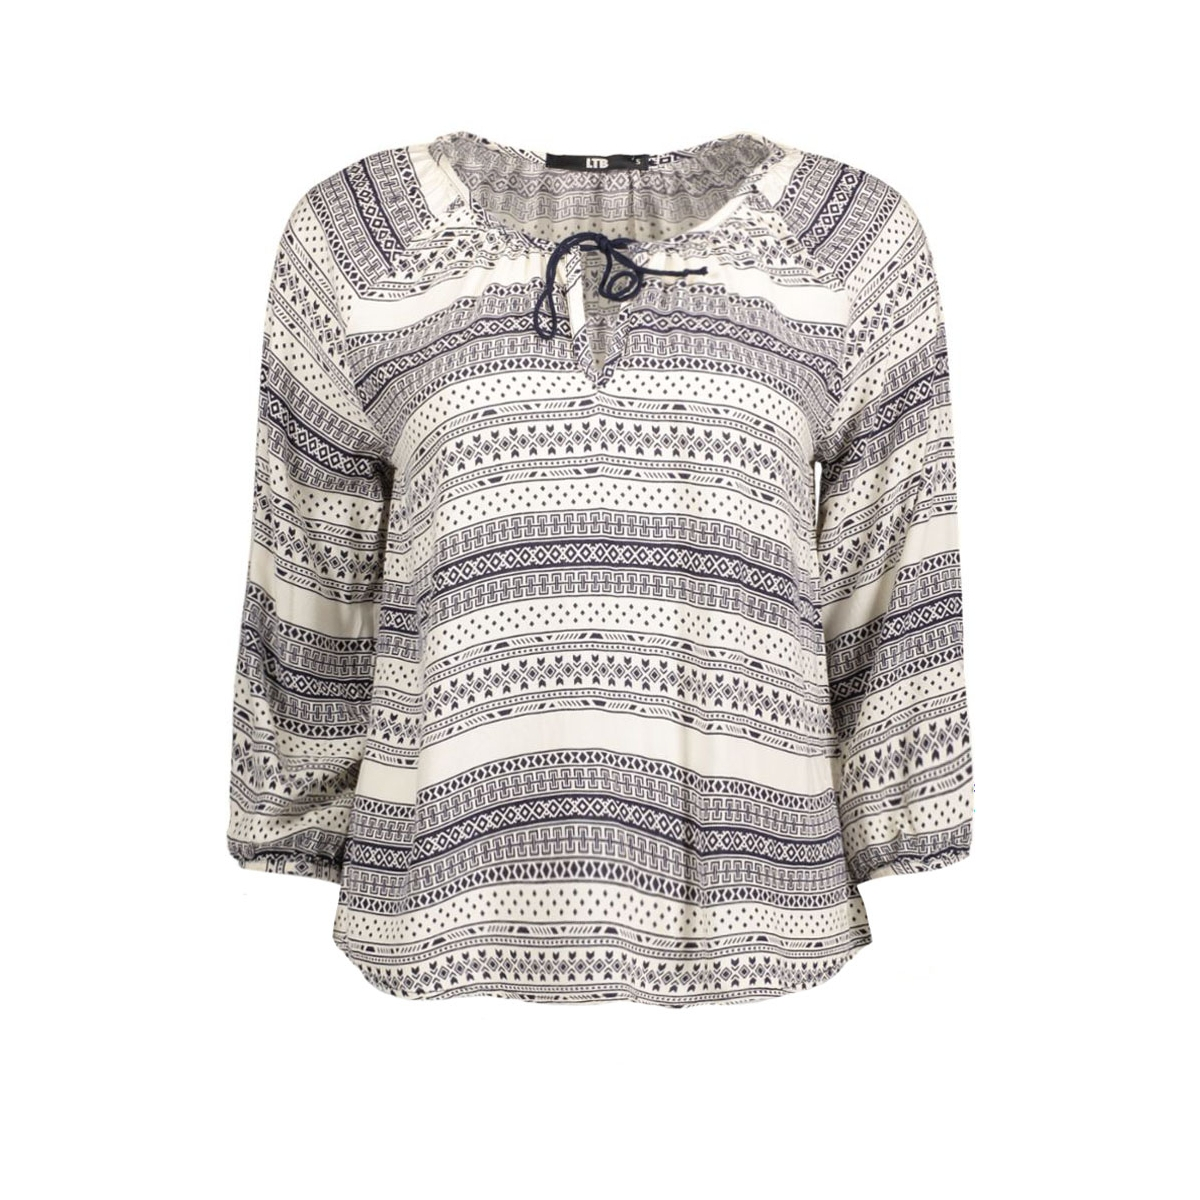 121645061.42637 ltb blouse navy